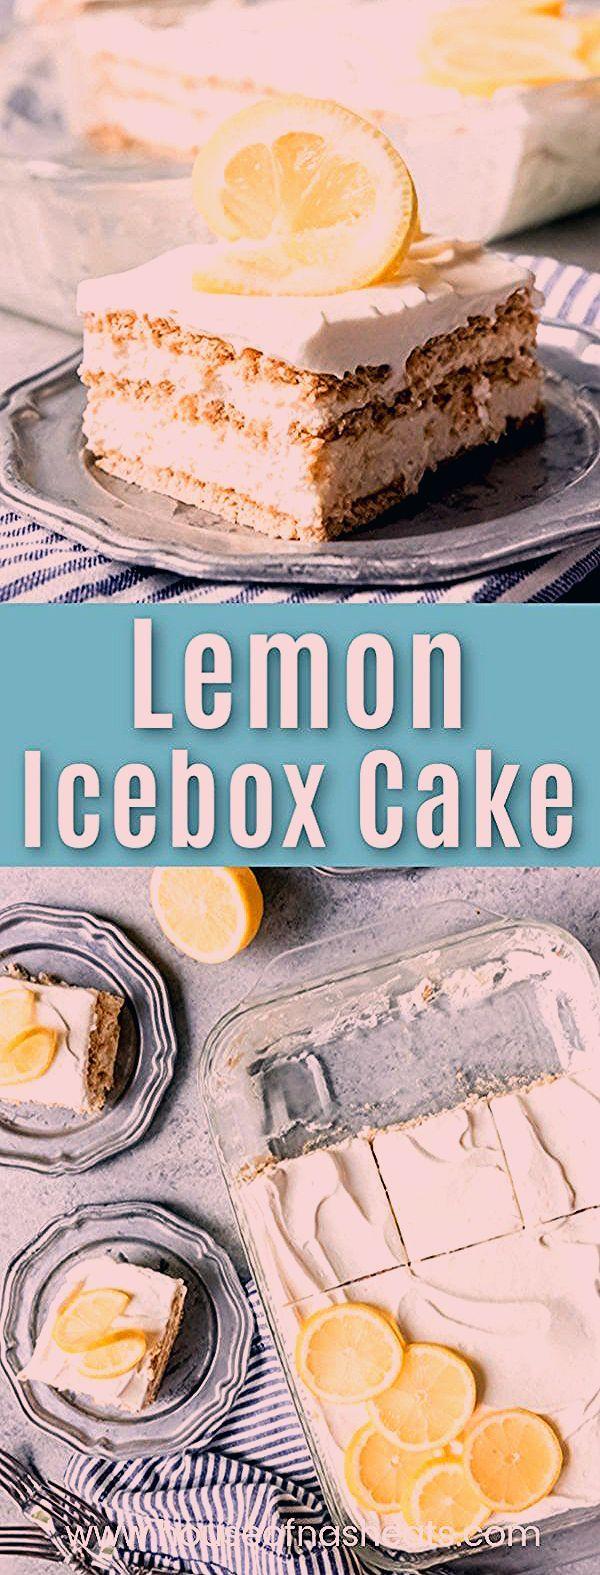 This Lemon Icebox Cake has layers of cool, creamy lemon filling, graham crackers, and sweetened whi